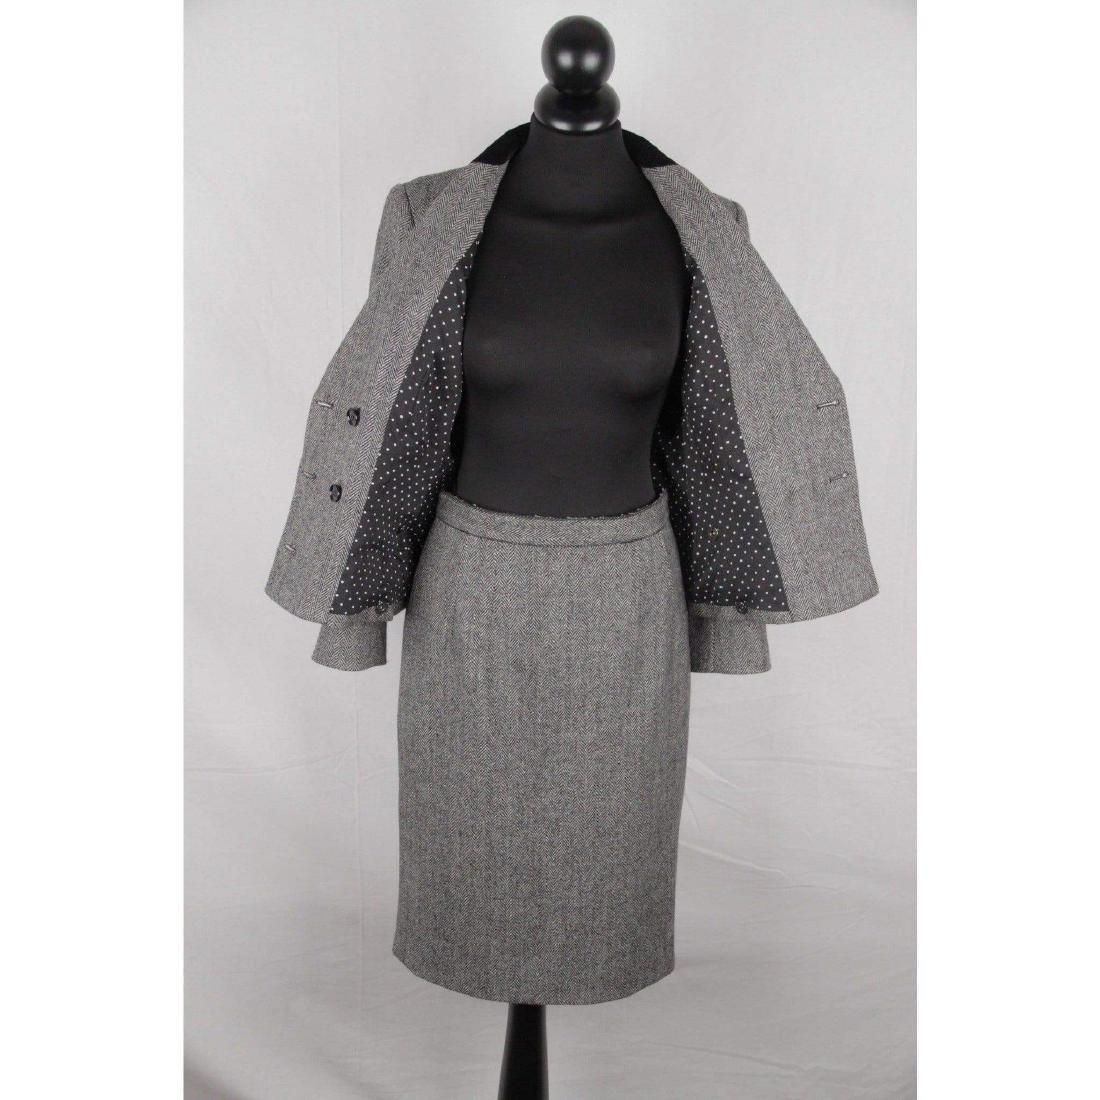 DOLCE & GABBANA Herringbone Wool Blend SUIT Blazer & - 8